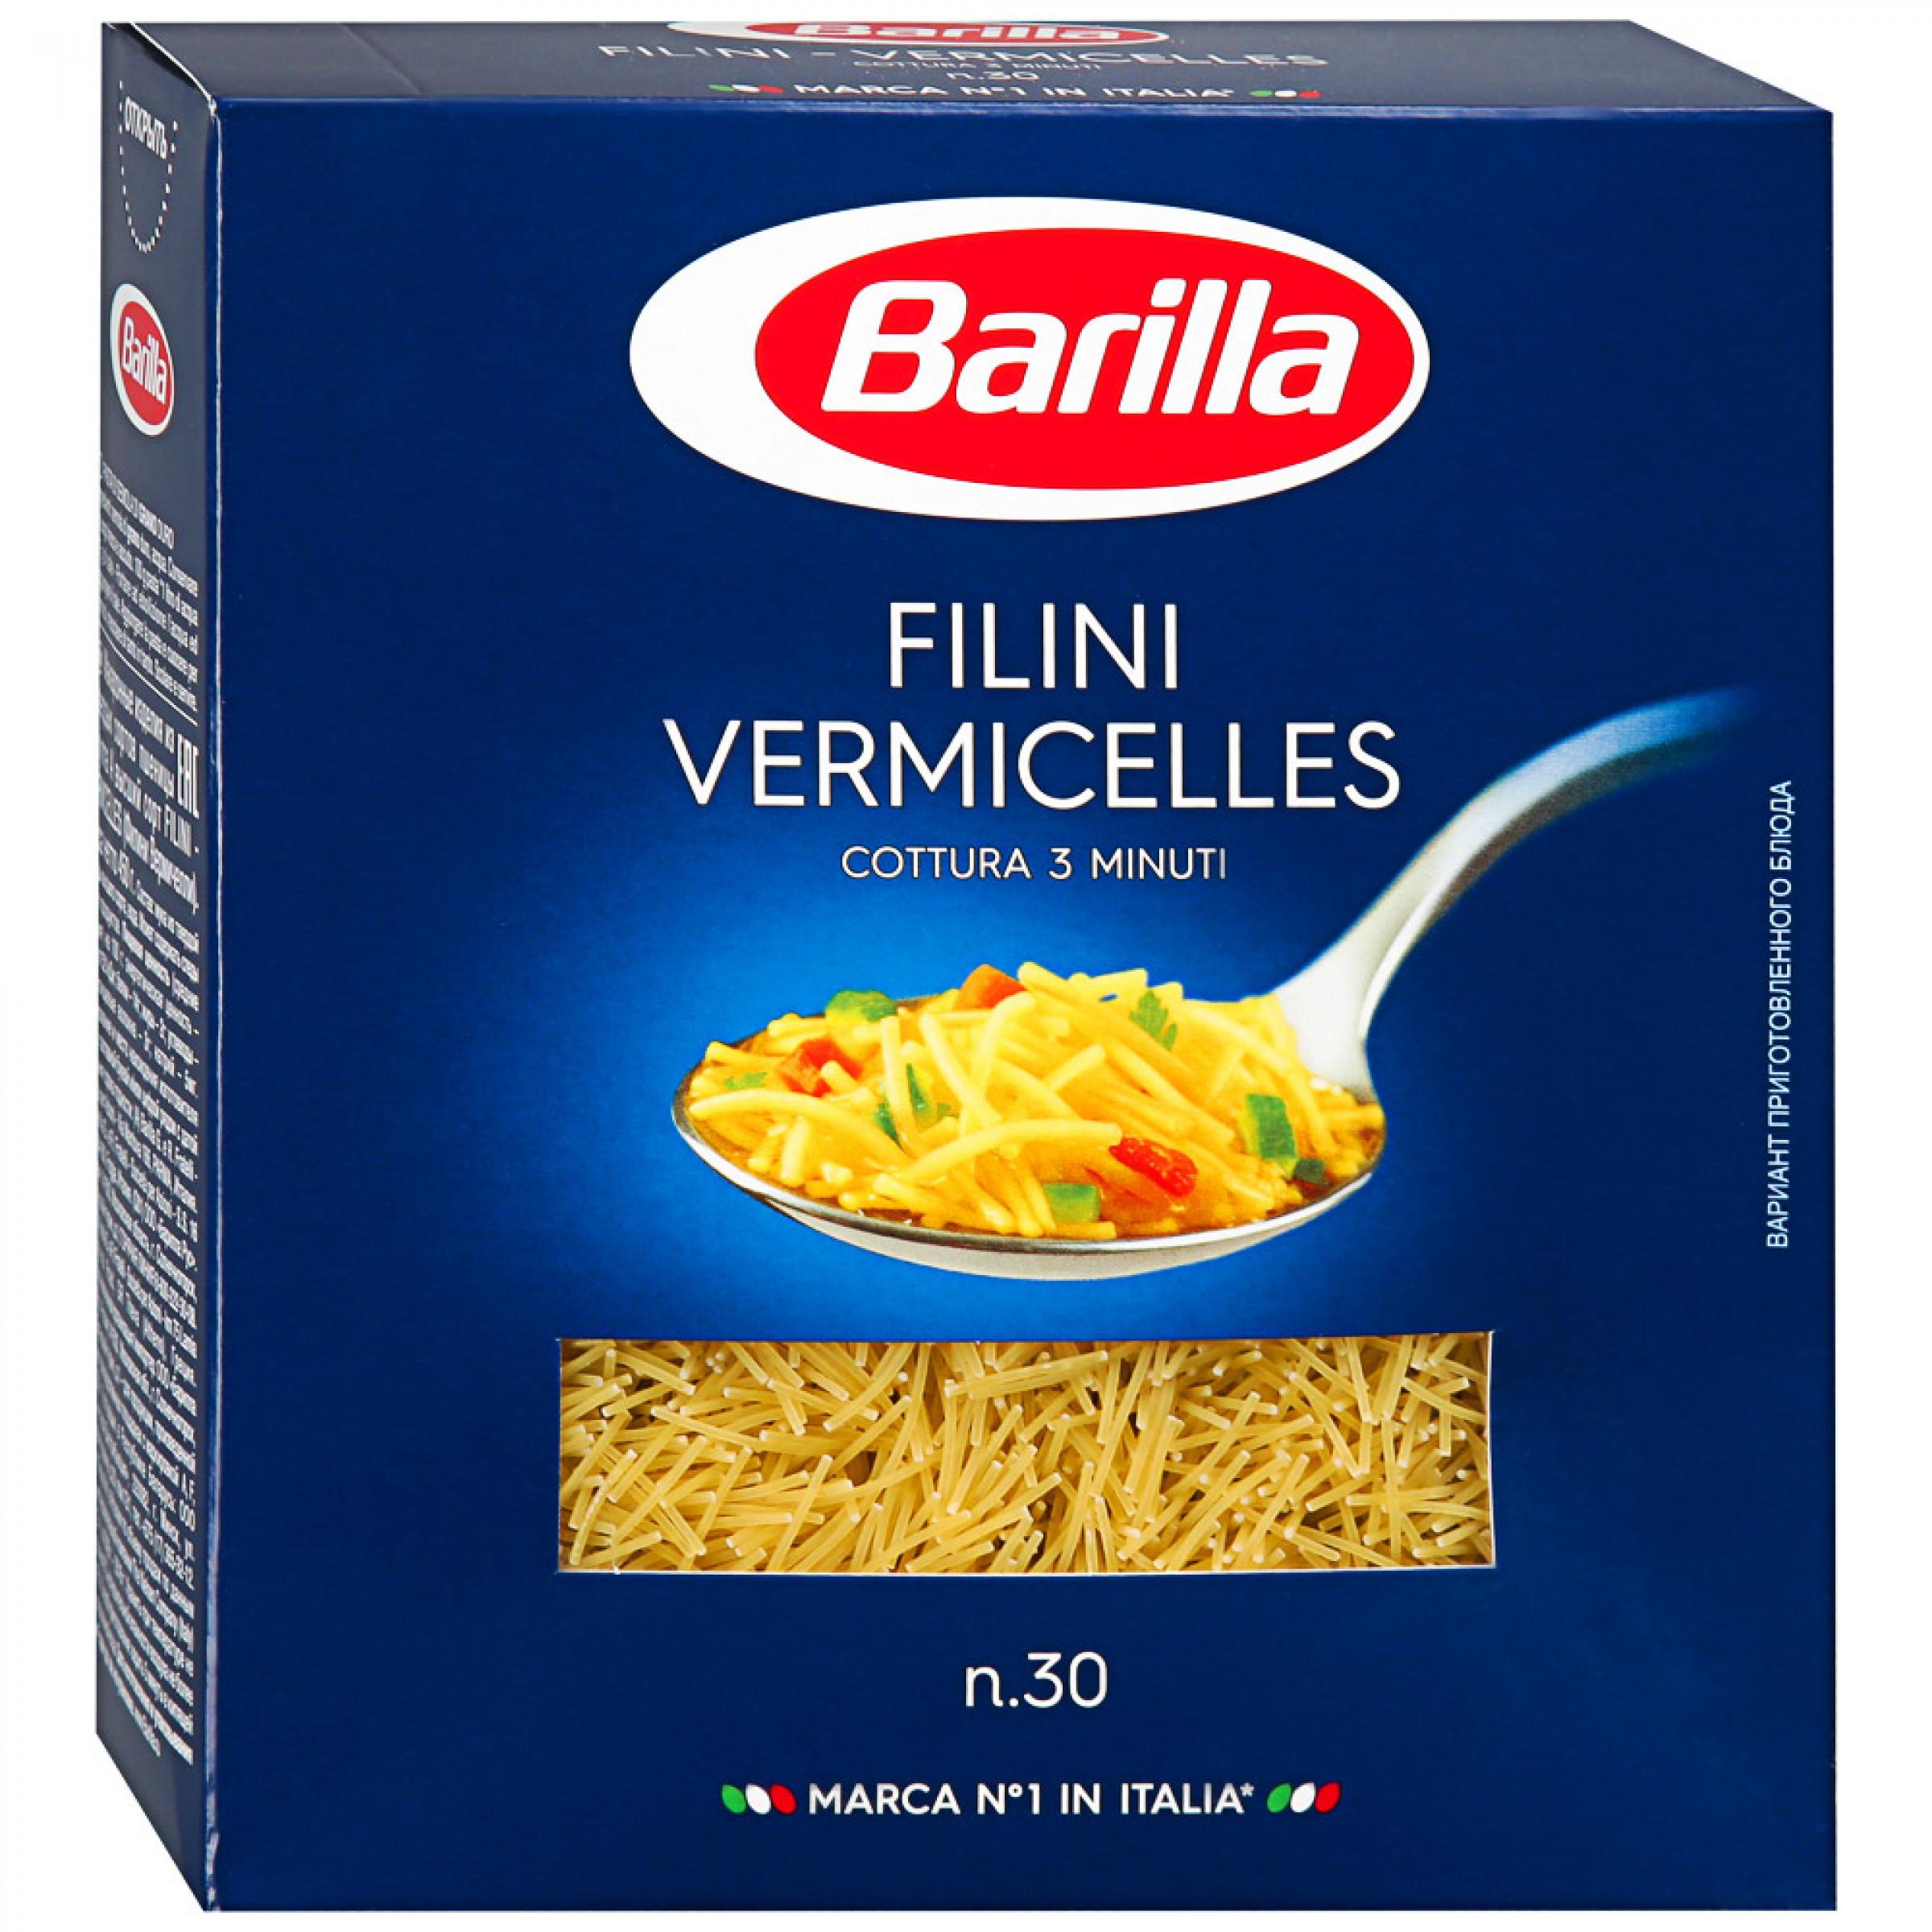 Макароны BARILLA вермишель FILINI-VERMICELLES, 450 гр